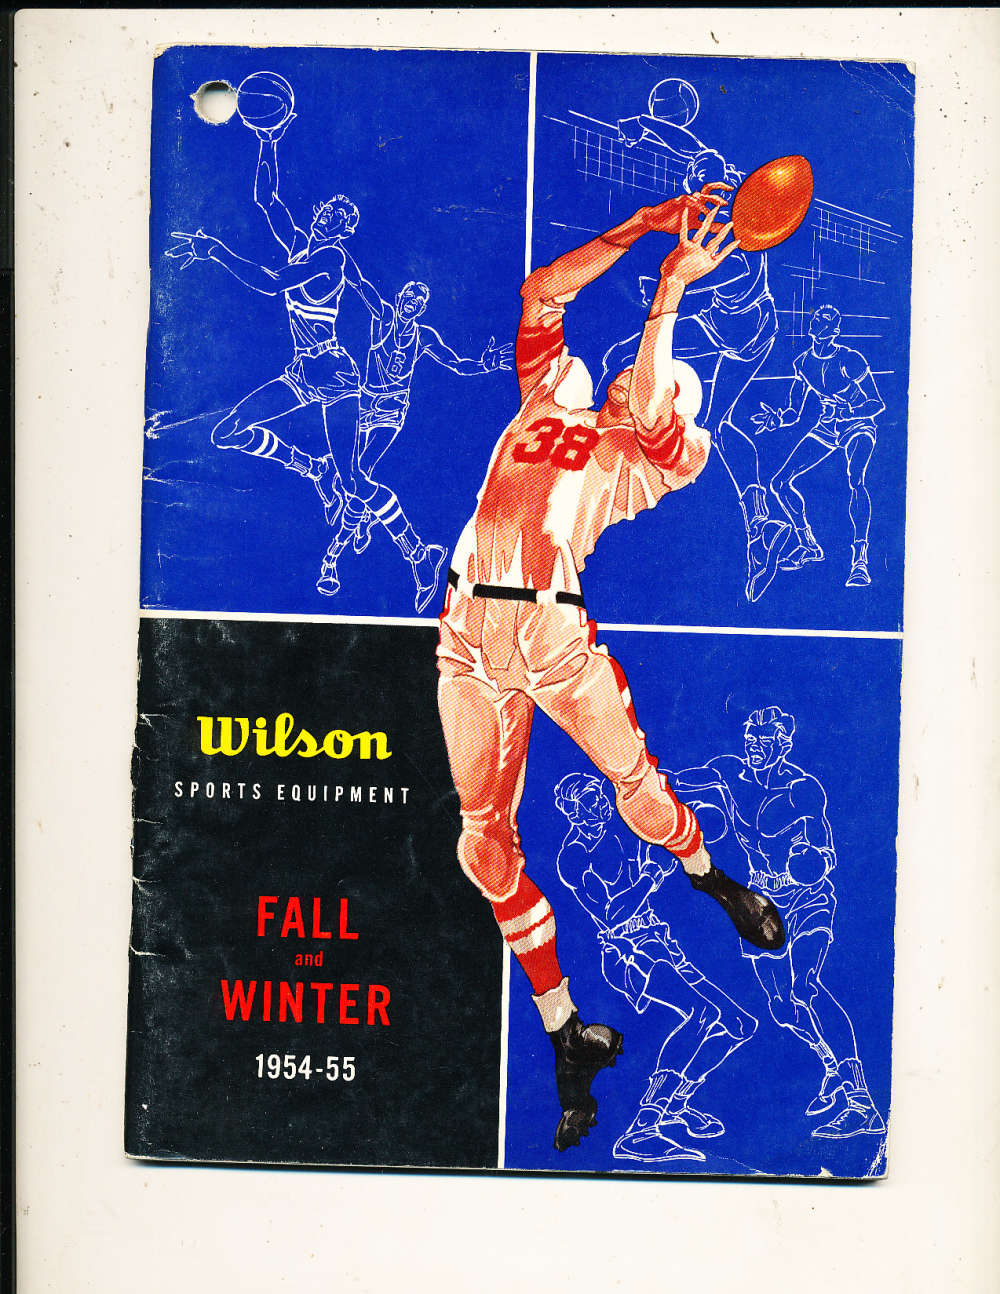 1954 Wilson Sports Equipment Catalog bx1